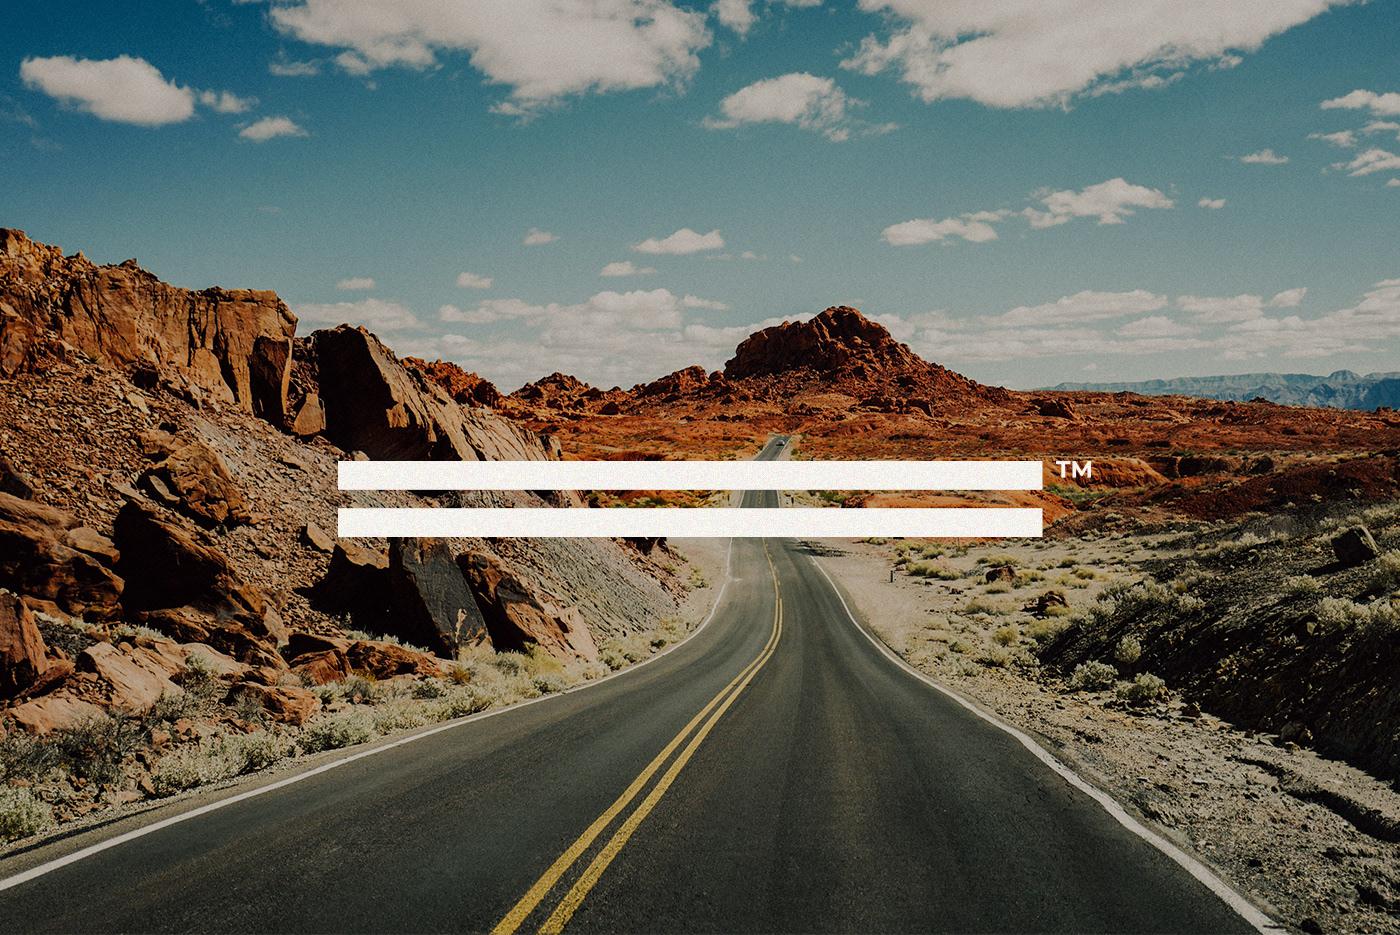 Travel roads yonder